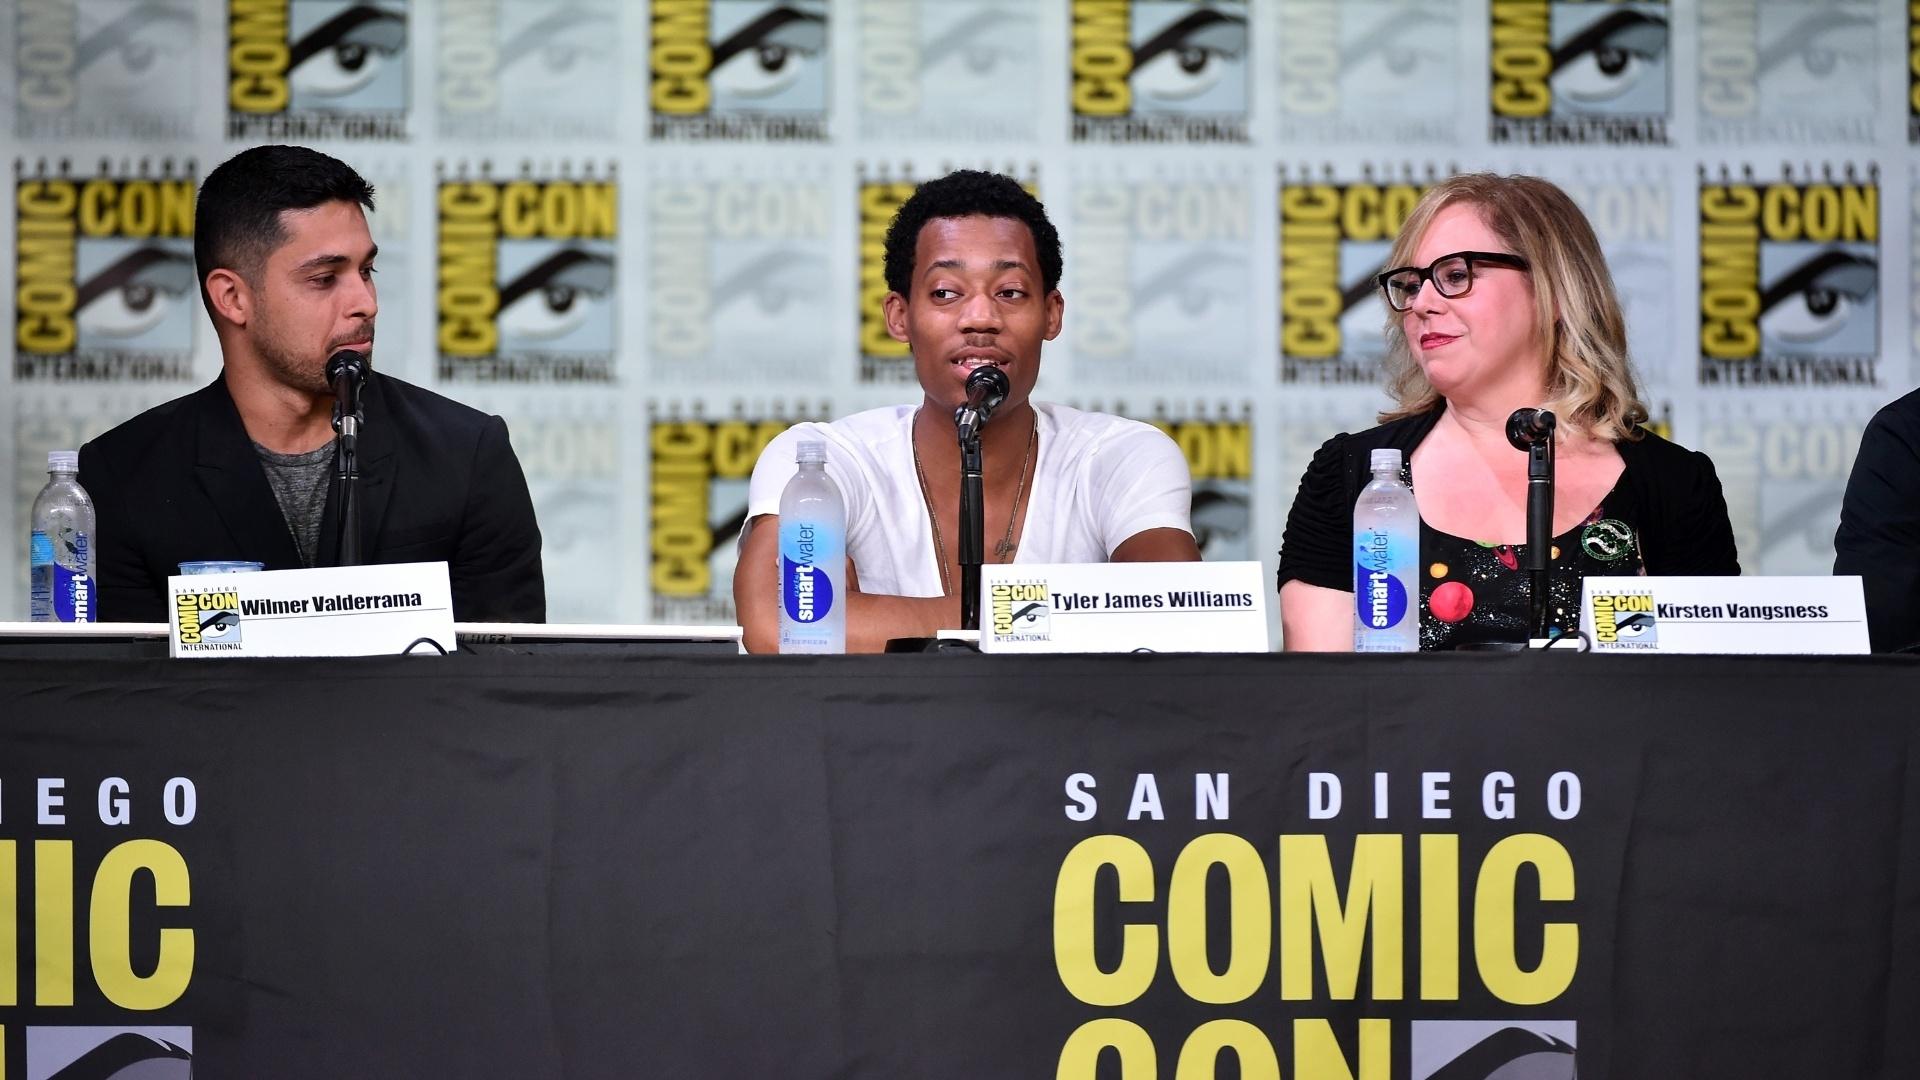 21.jul.2016 - Os atores Wilmer Valderrama, Tyler James Williams e Kirsten Vangsness no mesmo painel